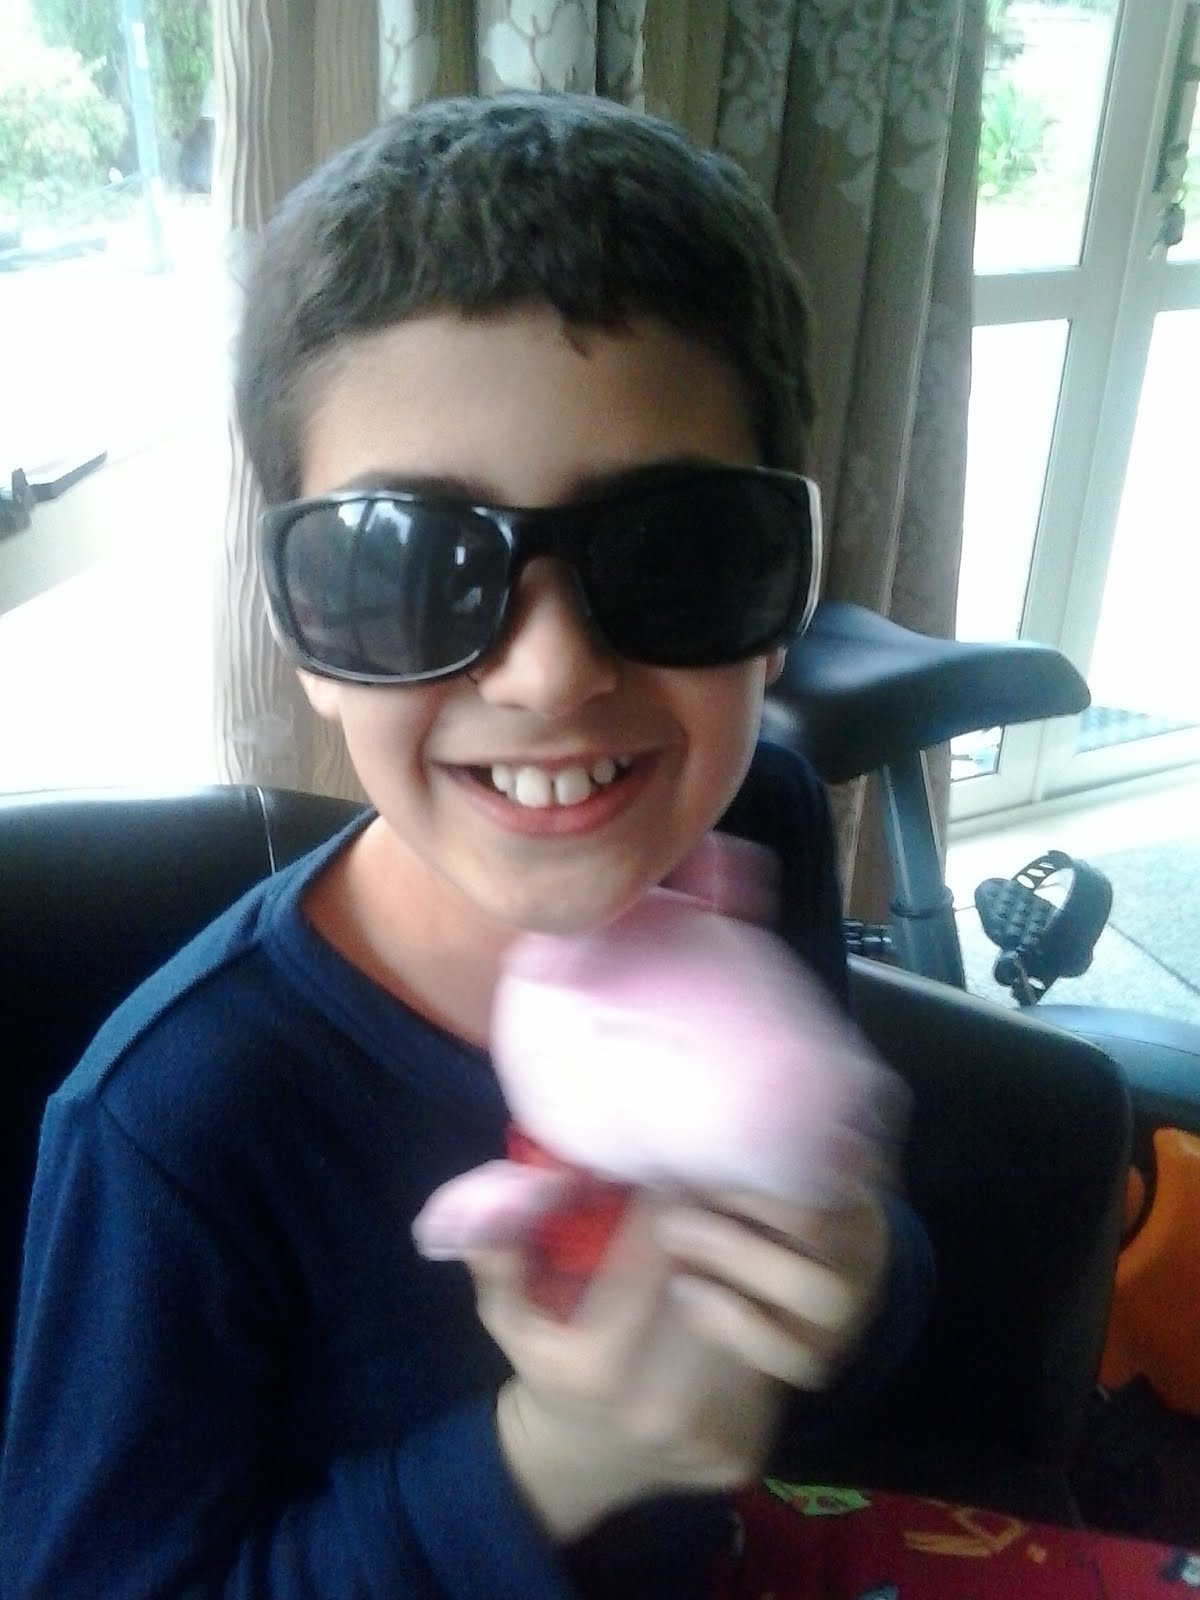 George - Age 9